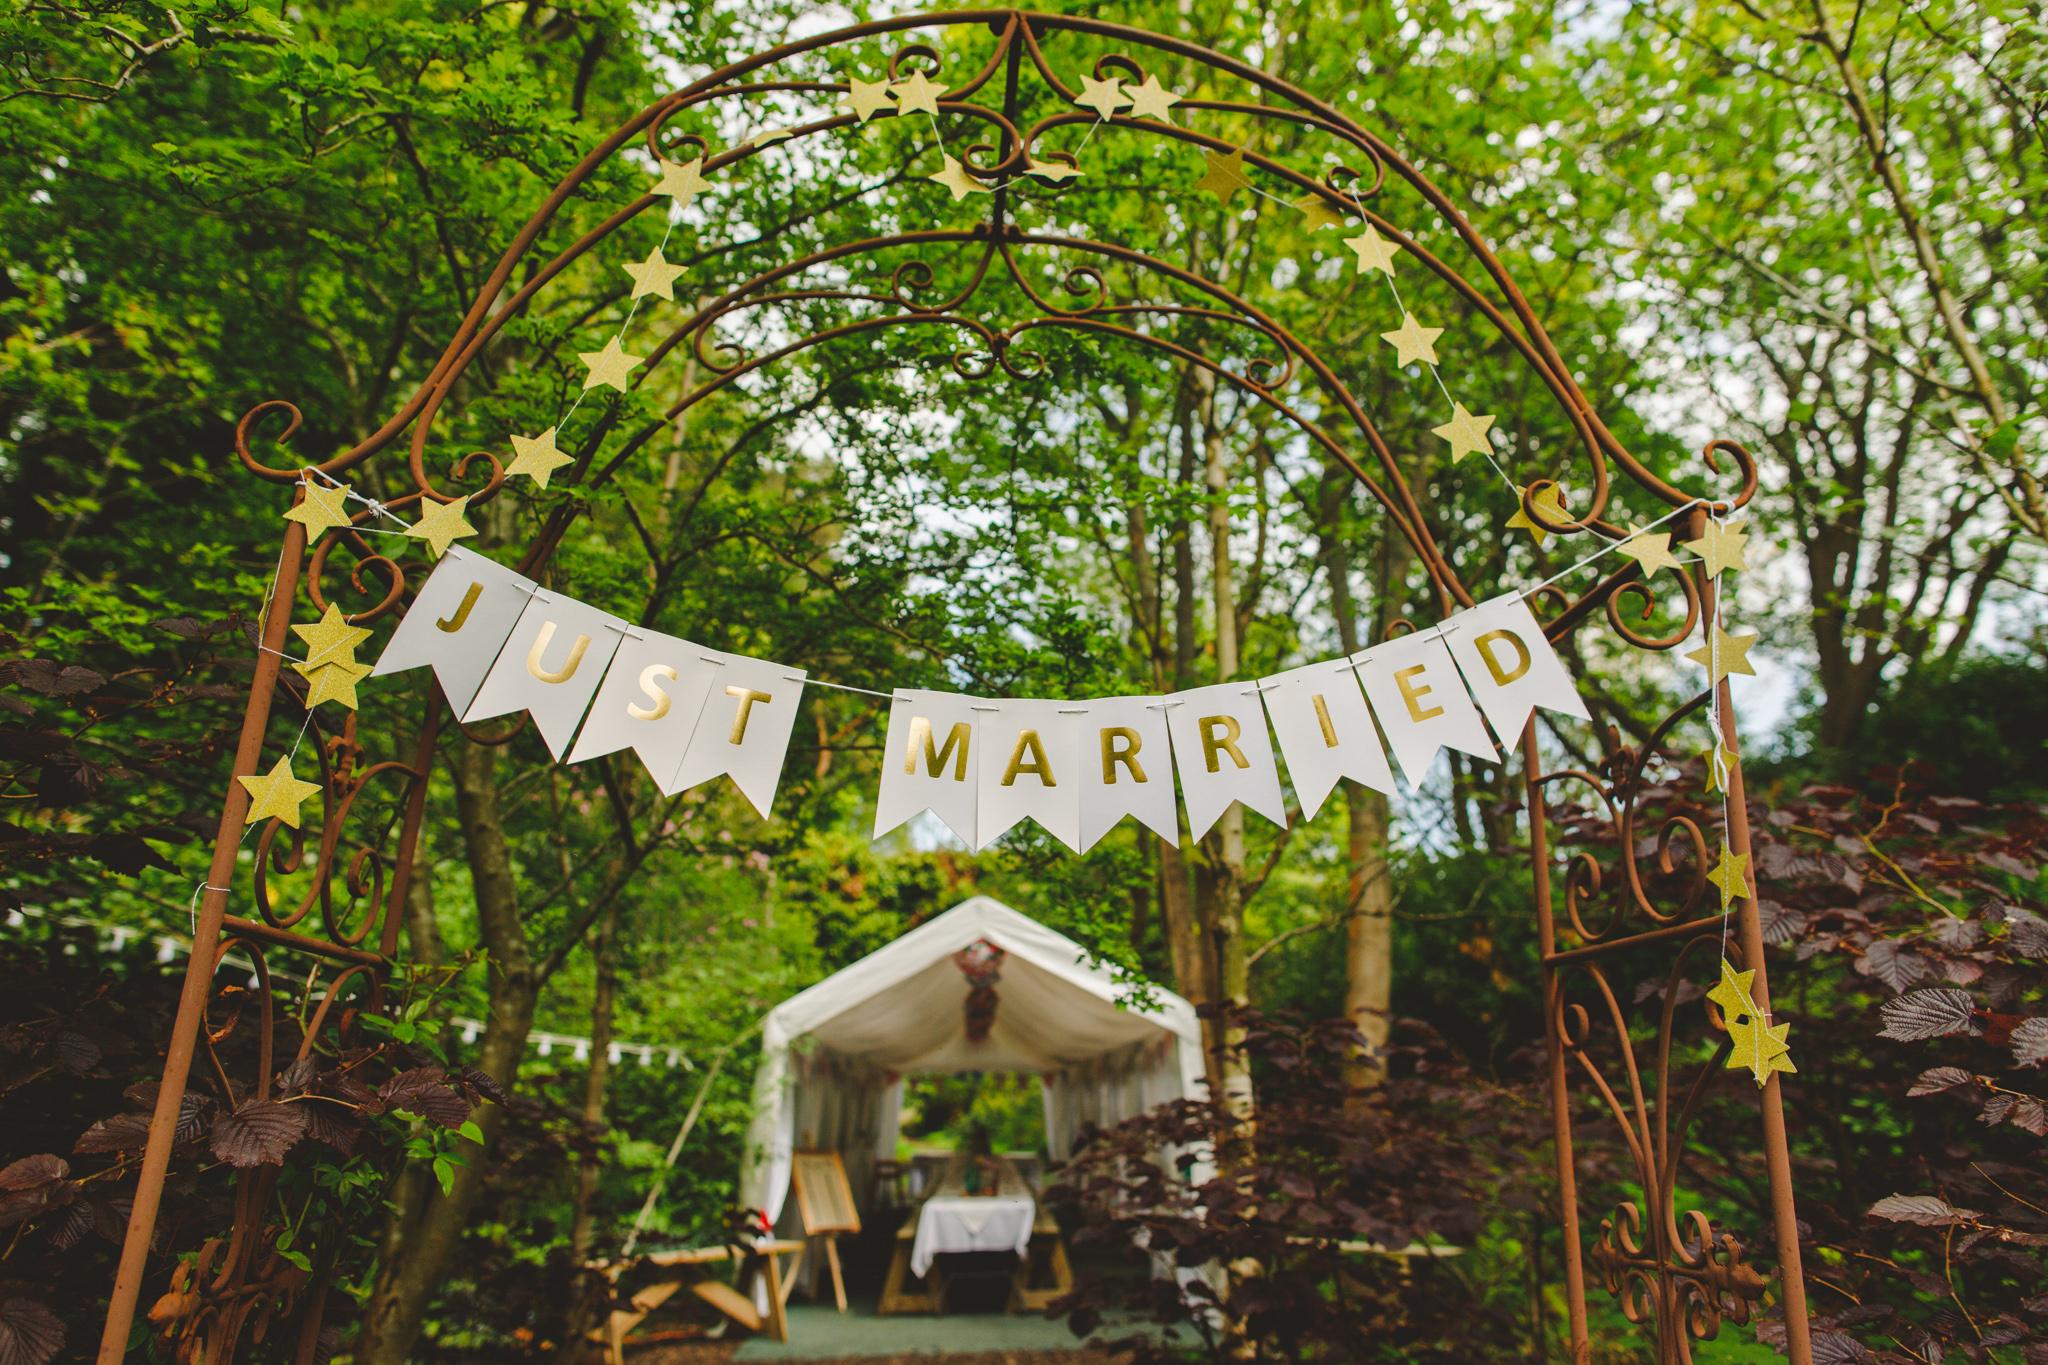 derbyshire-wedding-photographer-videographer-camera-hannah-63.jpg